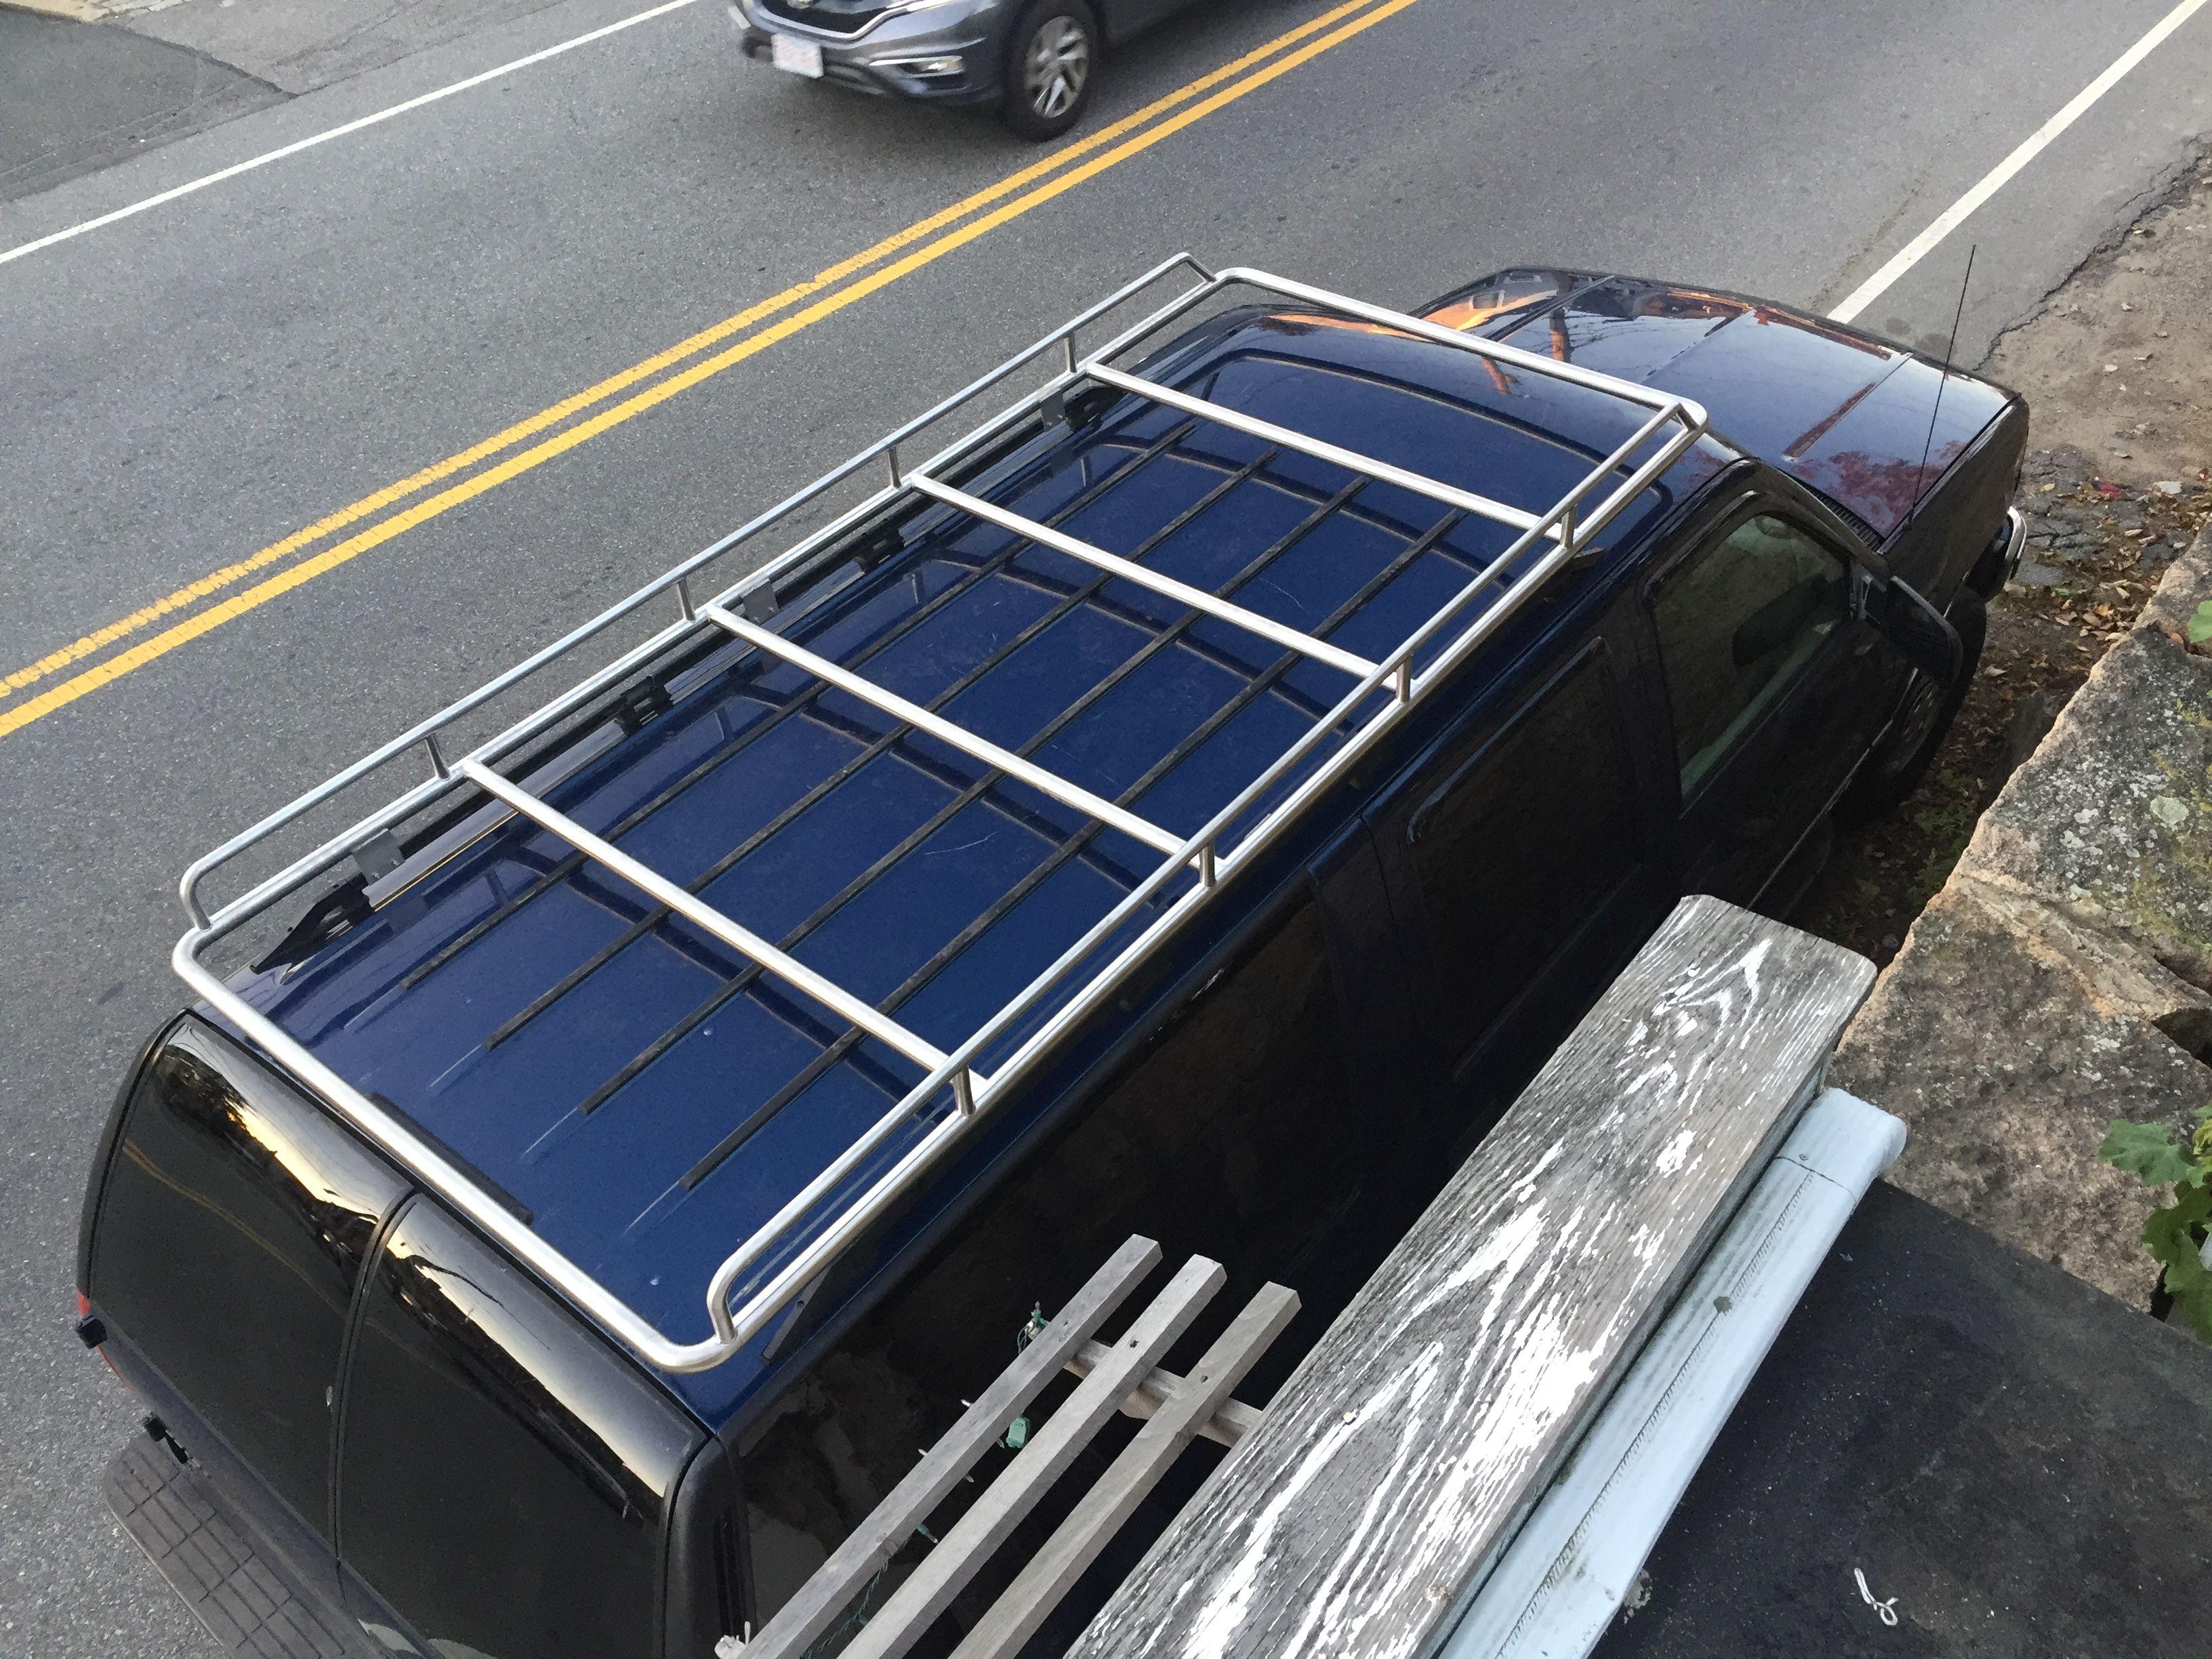 Chevy Suburban Roof Rack Suburban Ideas Pinterest